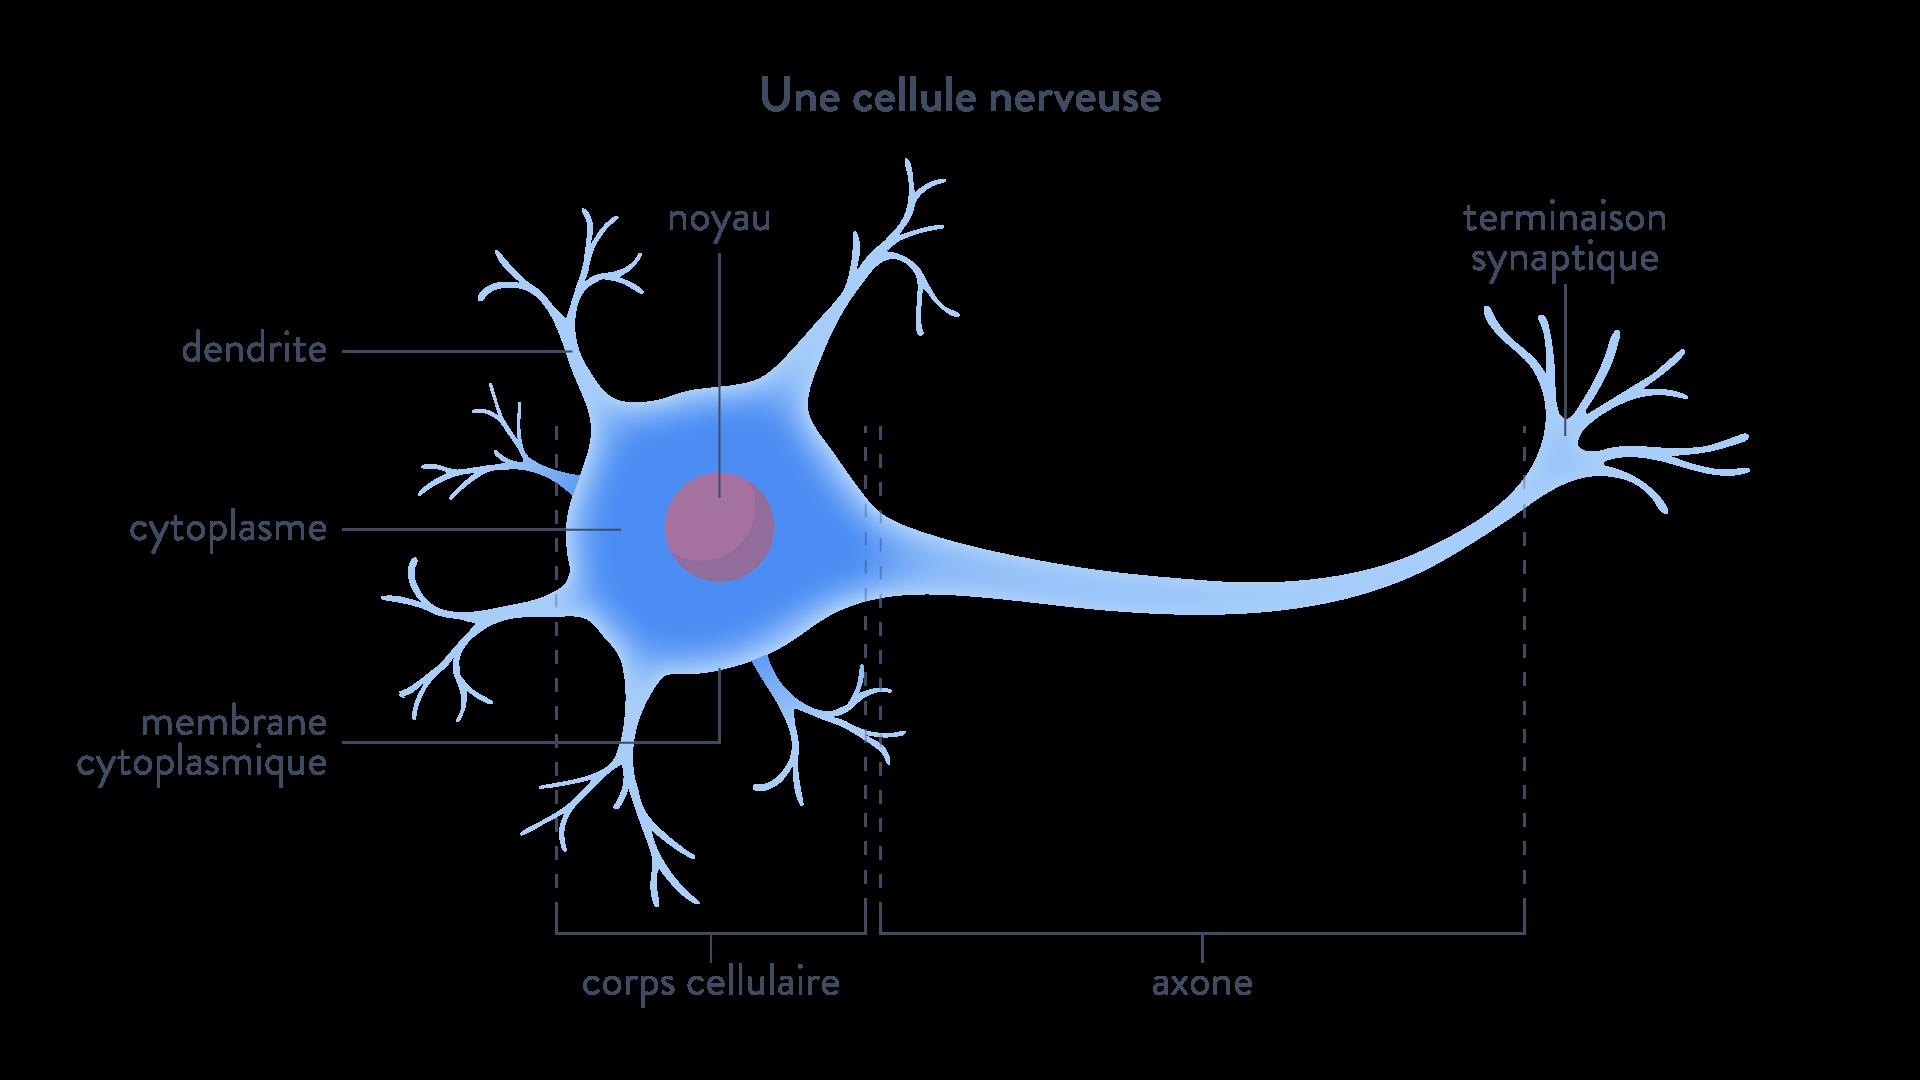 cellule nerveuse synapses dopamine